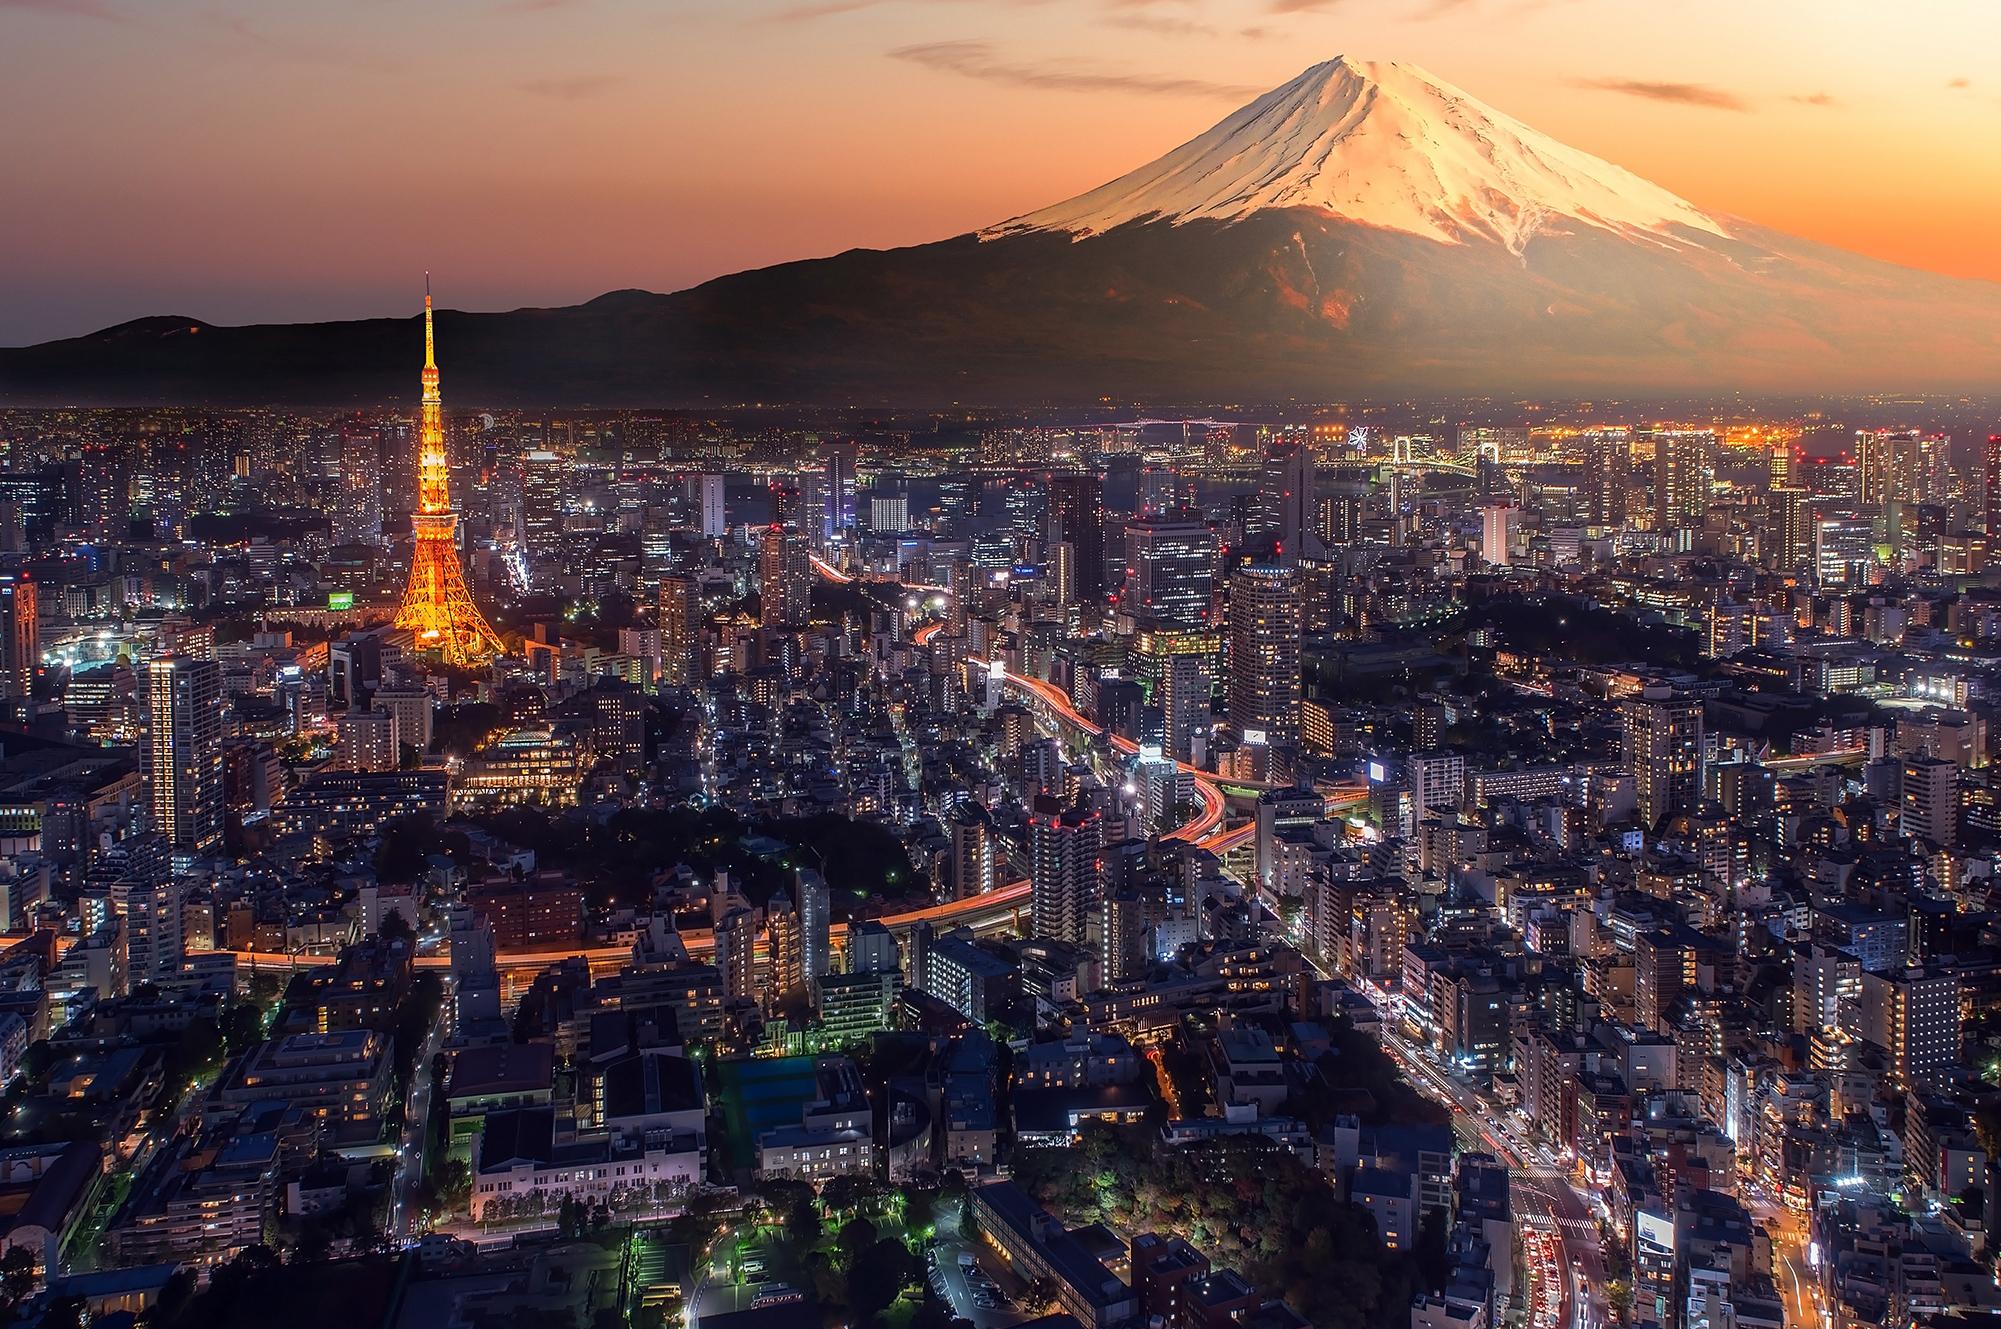 Tokio, Japón. Foto: Cedida por eDreams ODIGEO